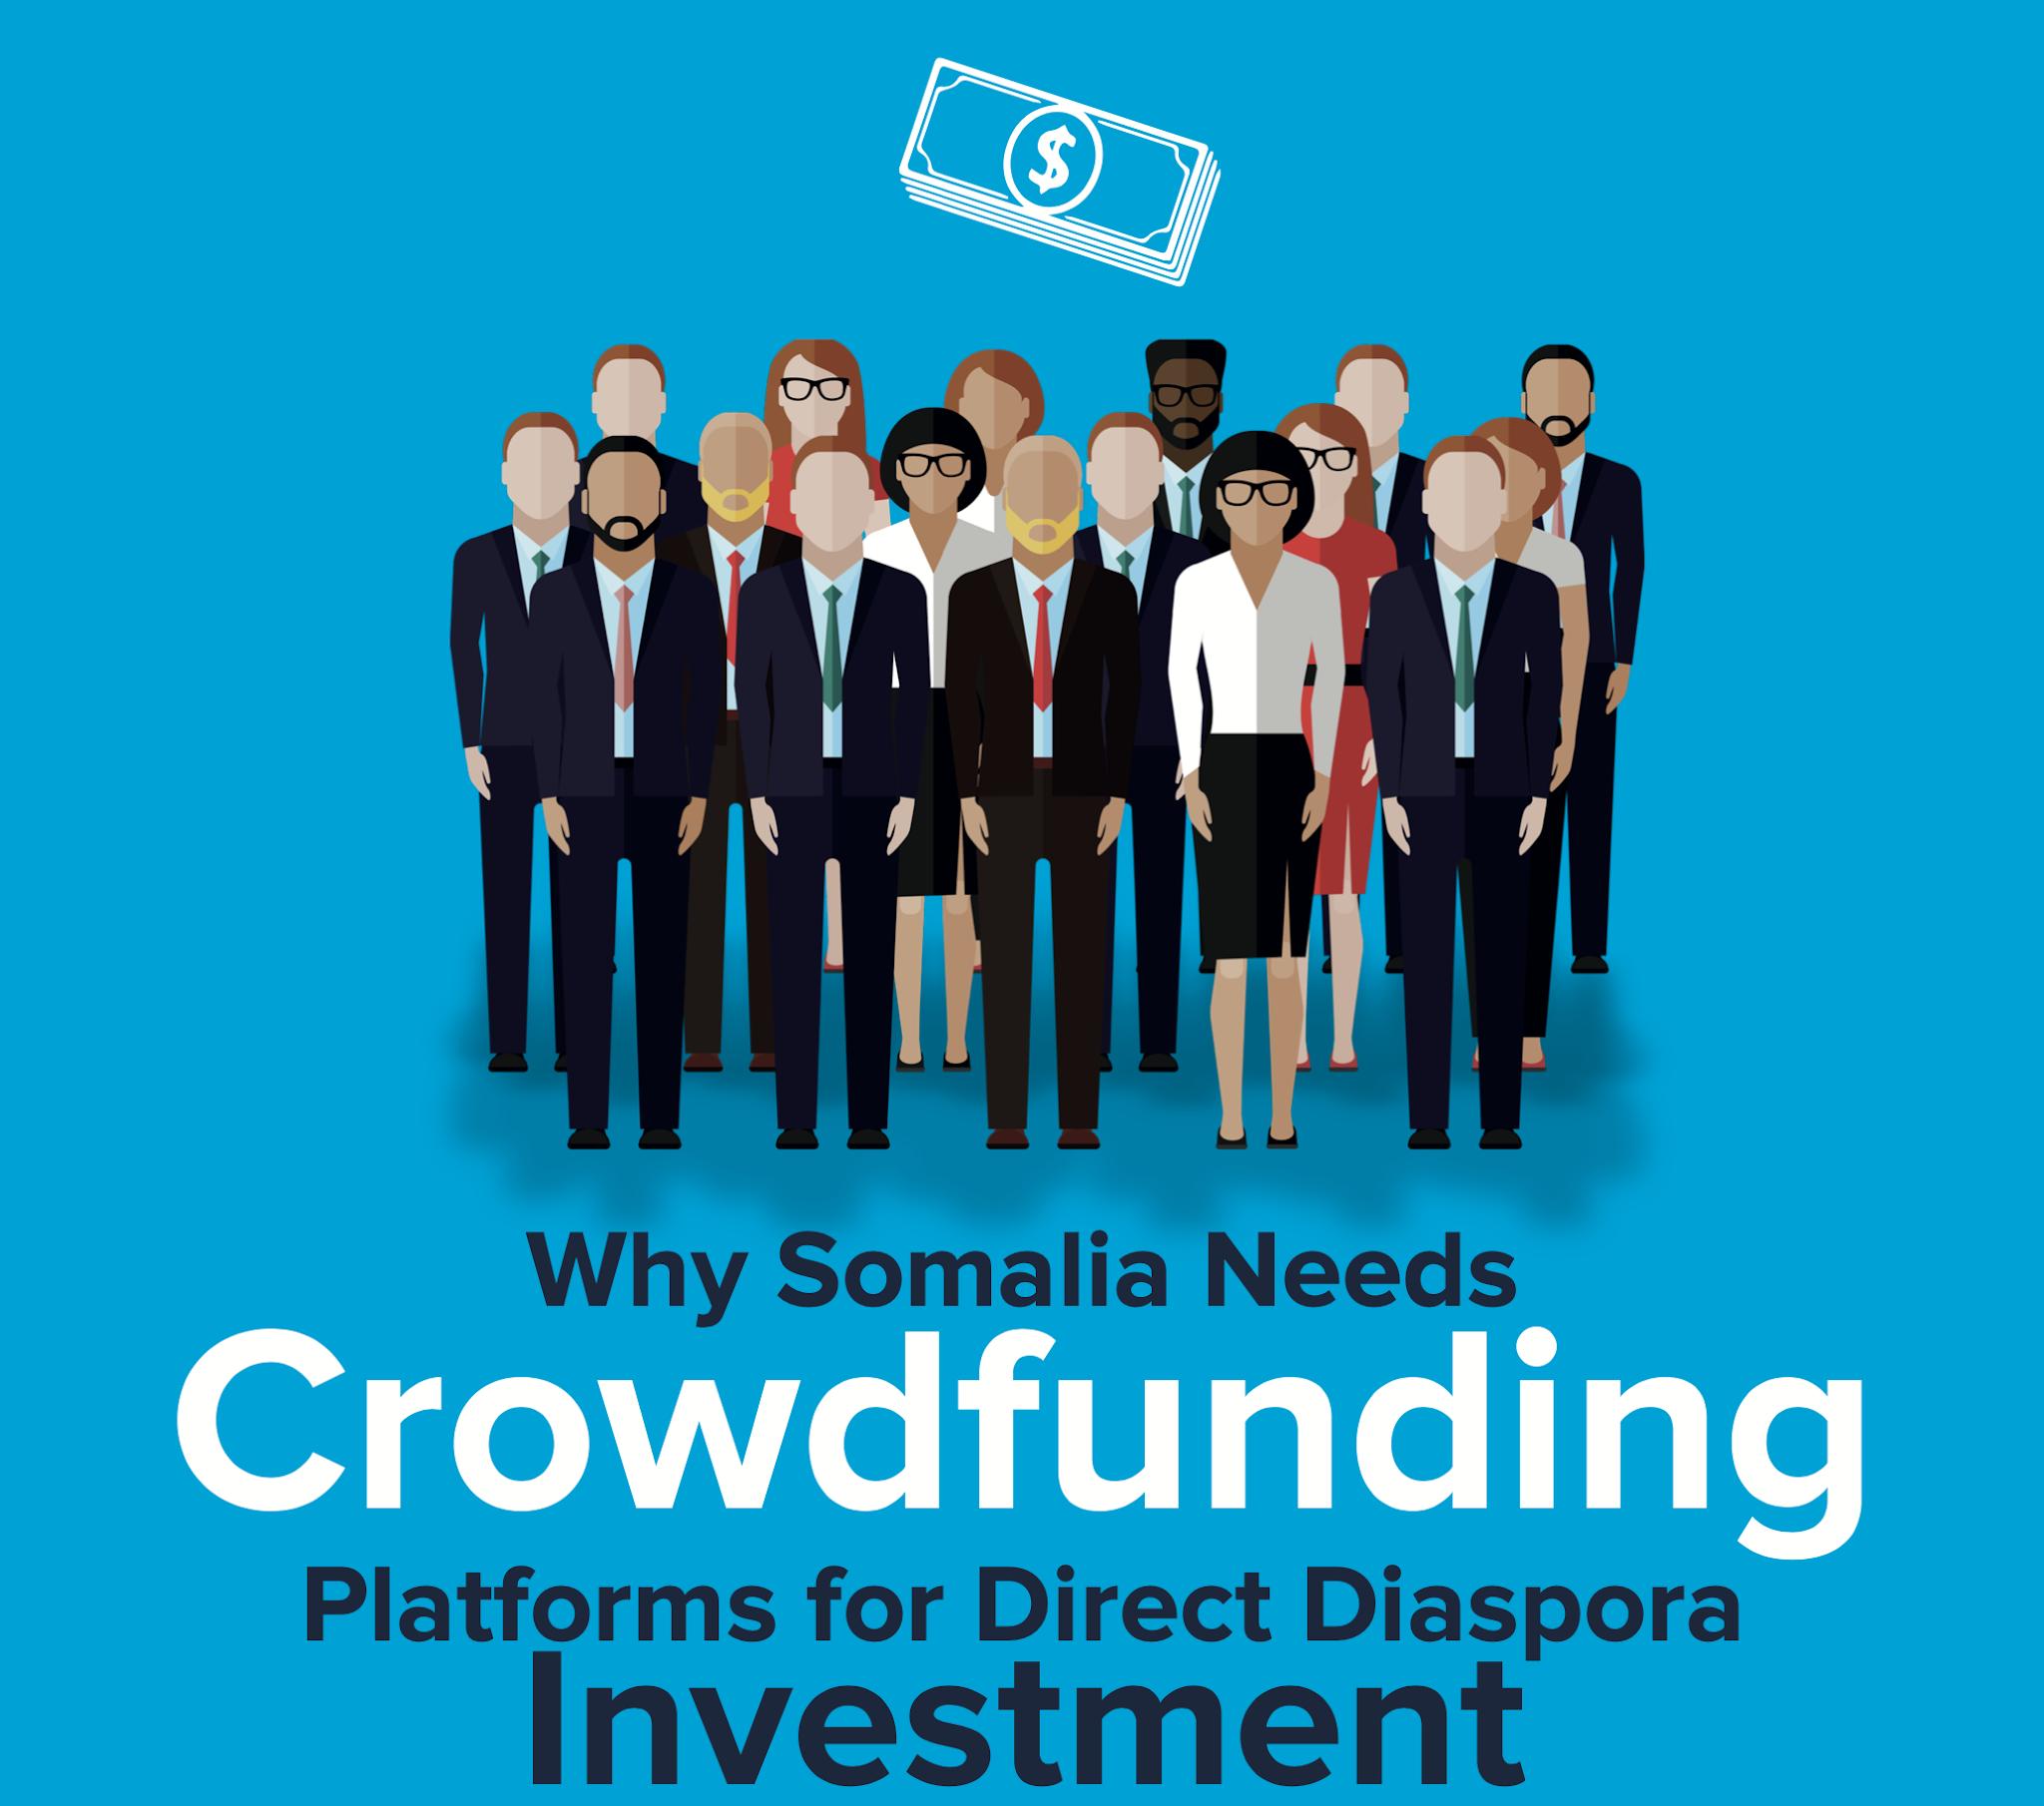 Why Somalia Needs Crowdfunding Platforms for Direct Diaspora Investment